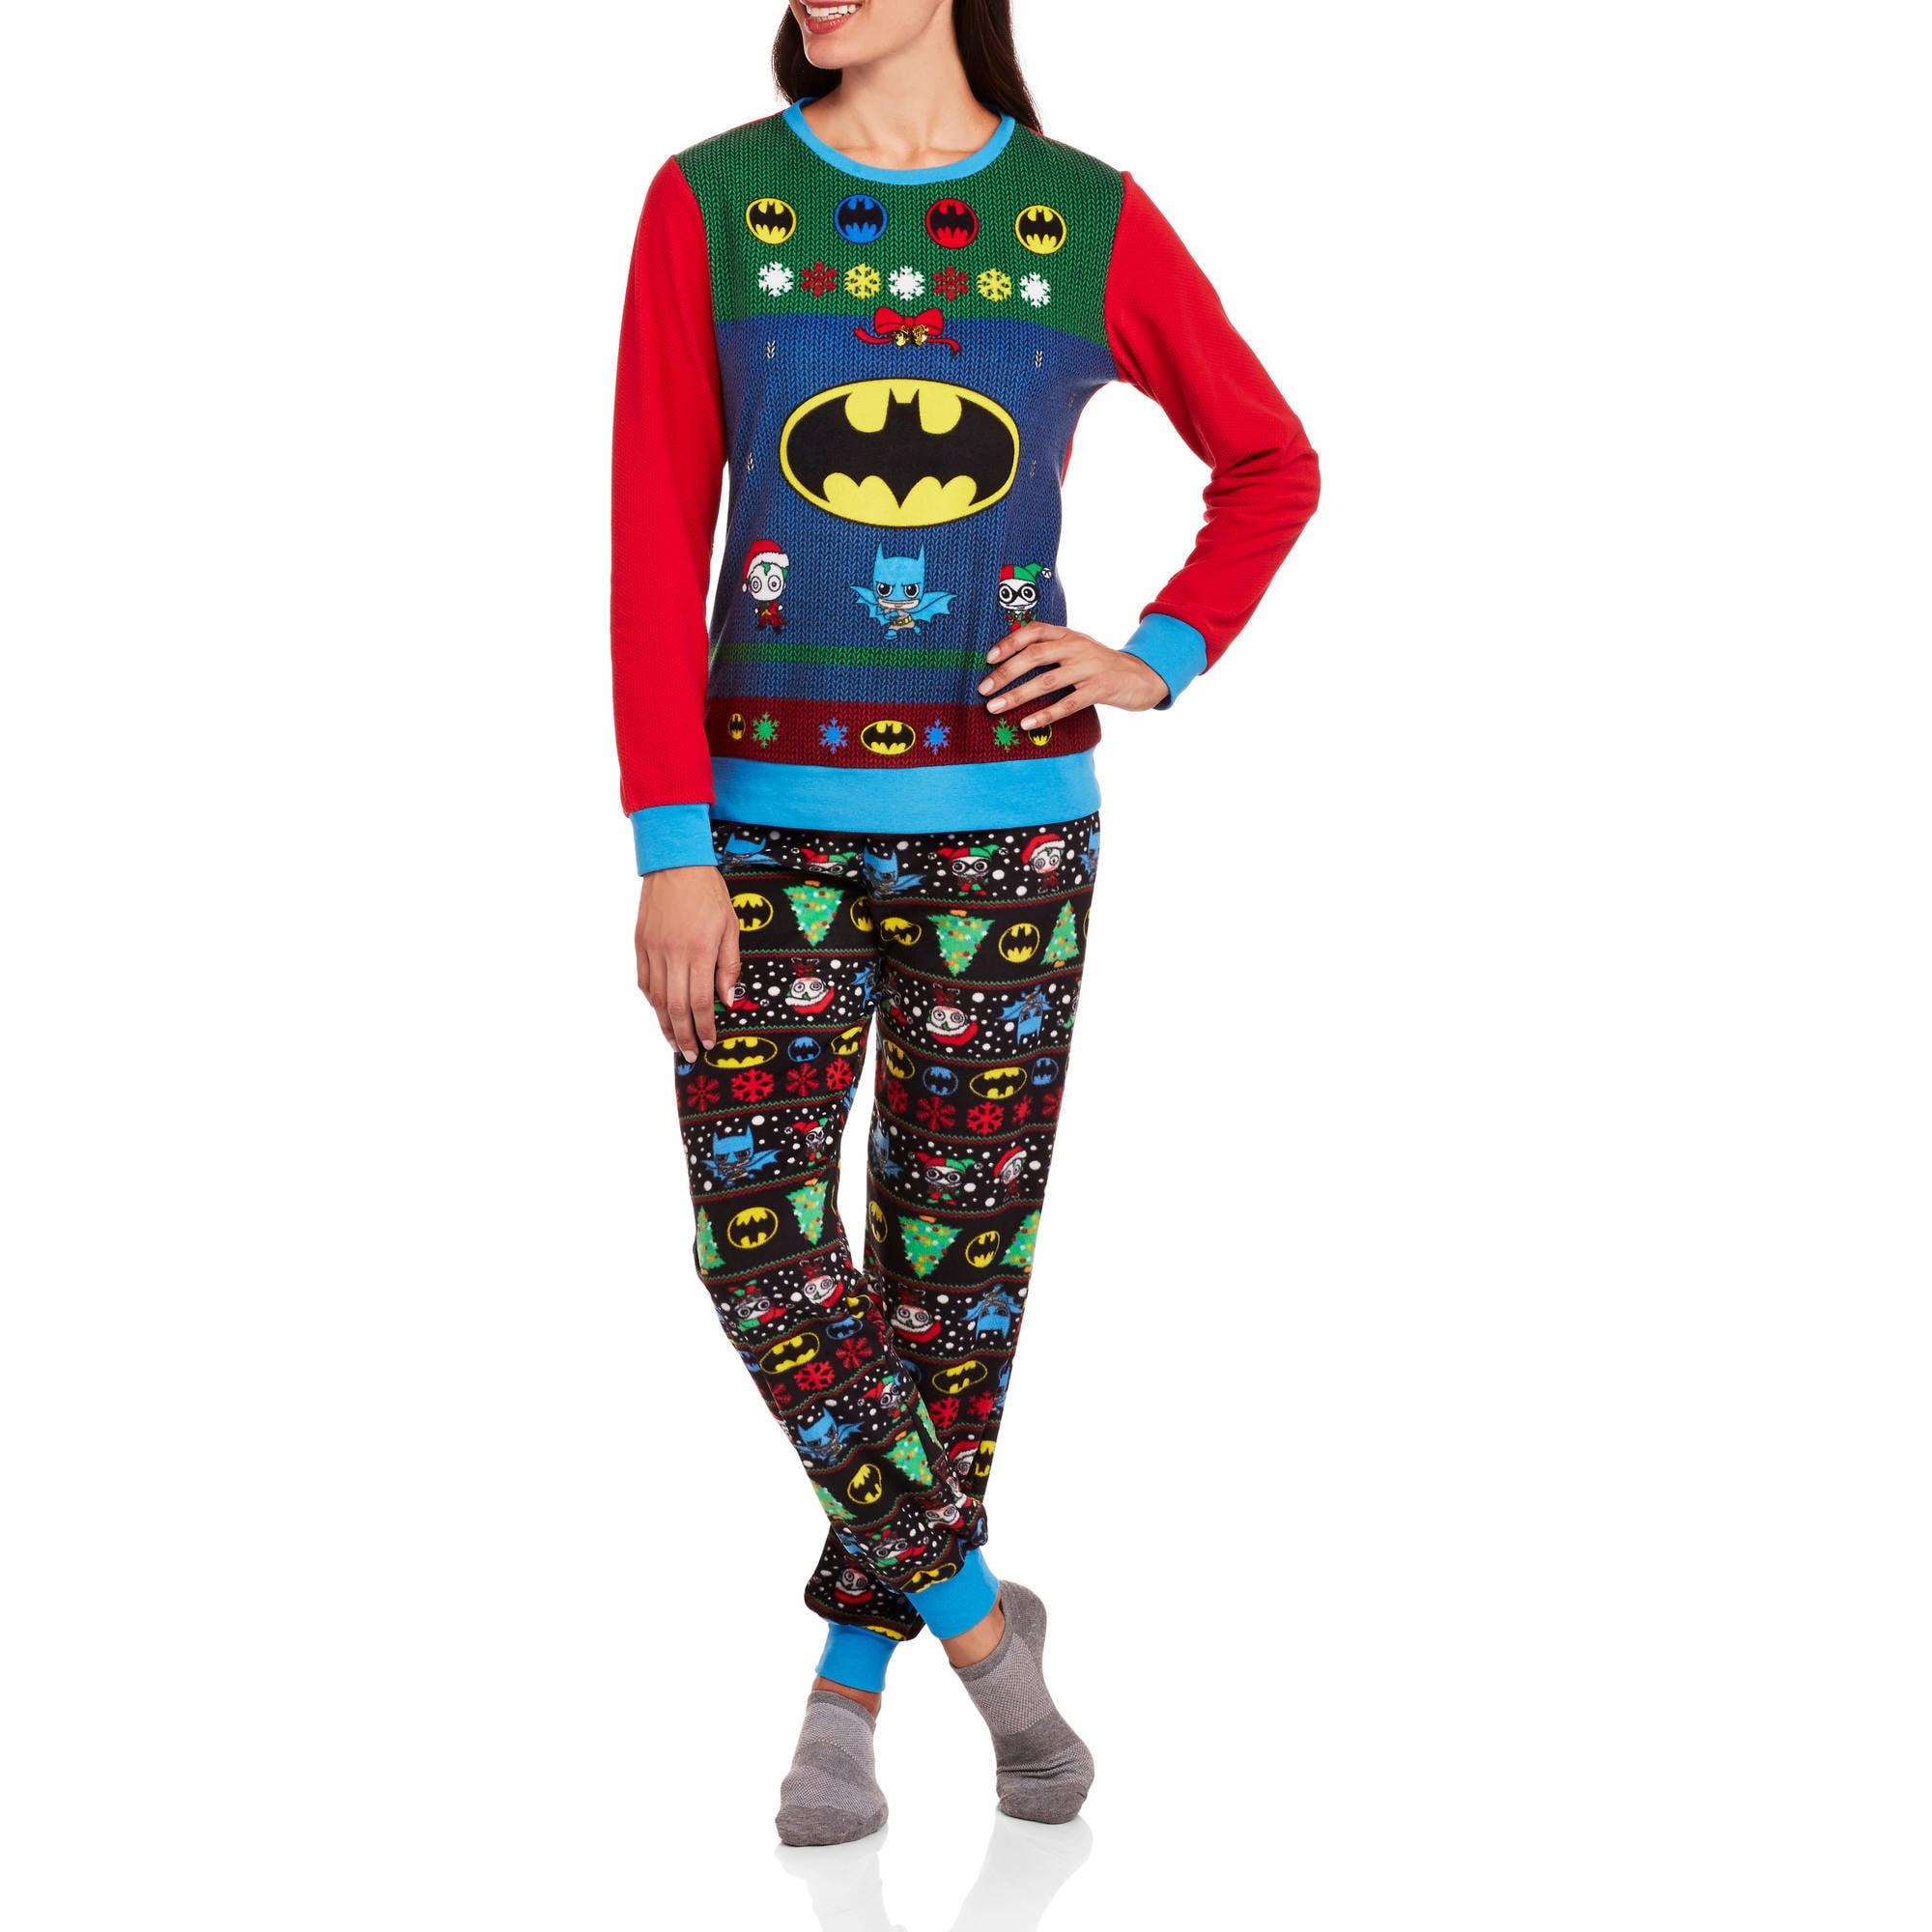 Batman Women's License Pajama Ugly Sweater Fashion  2 Piece Sleepwear Set